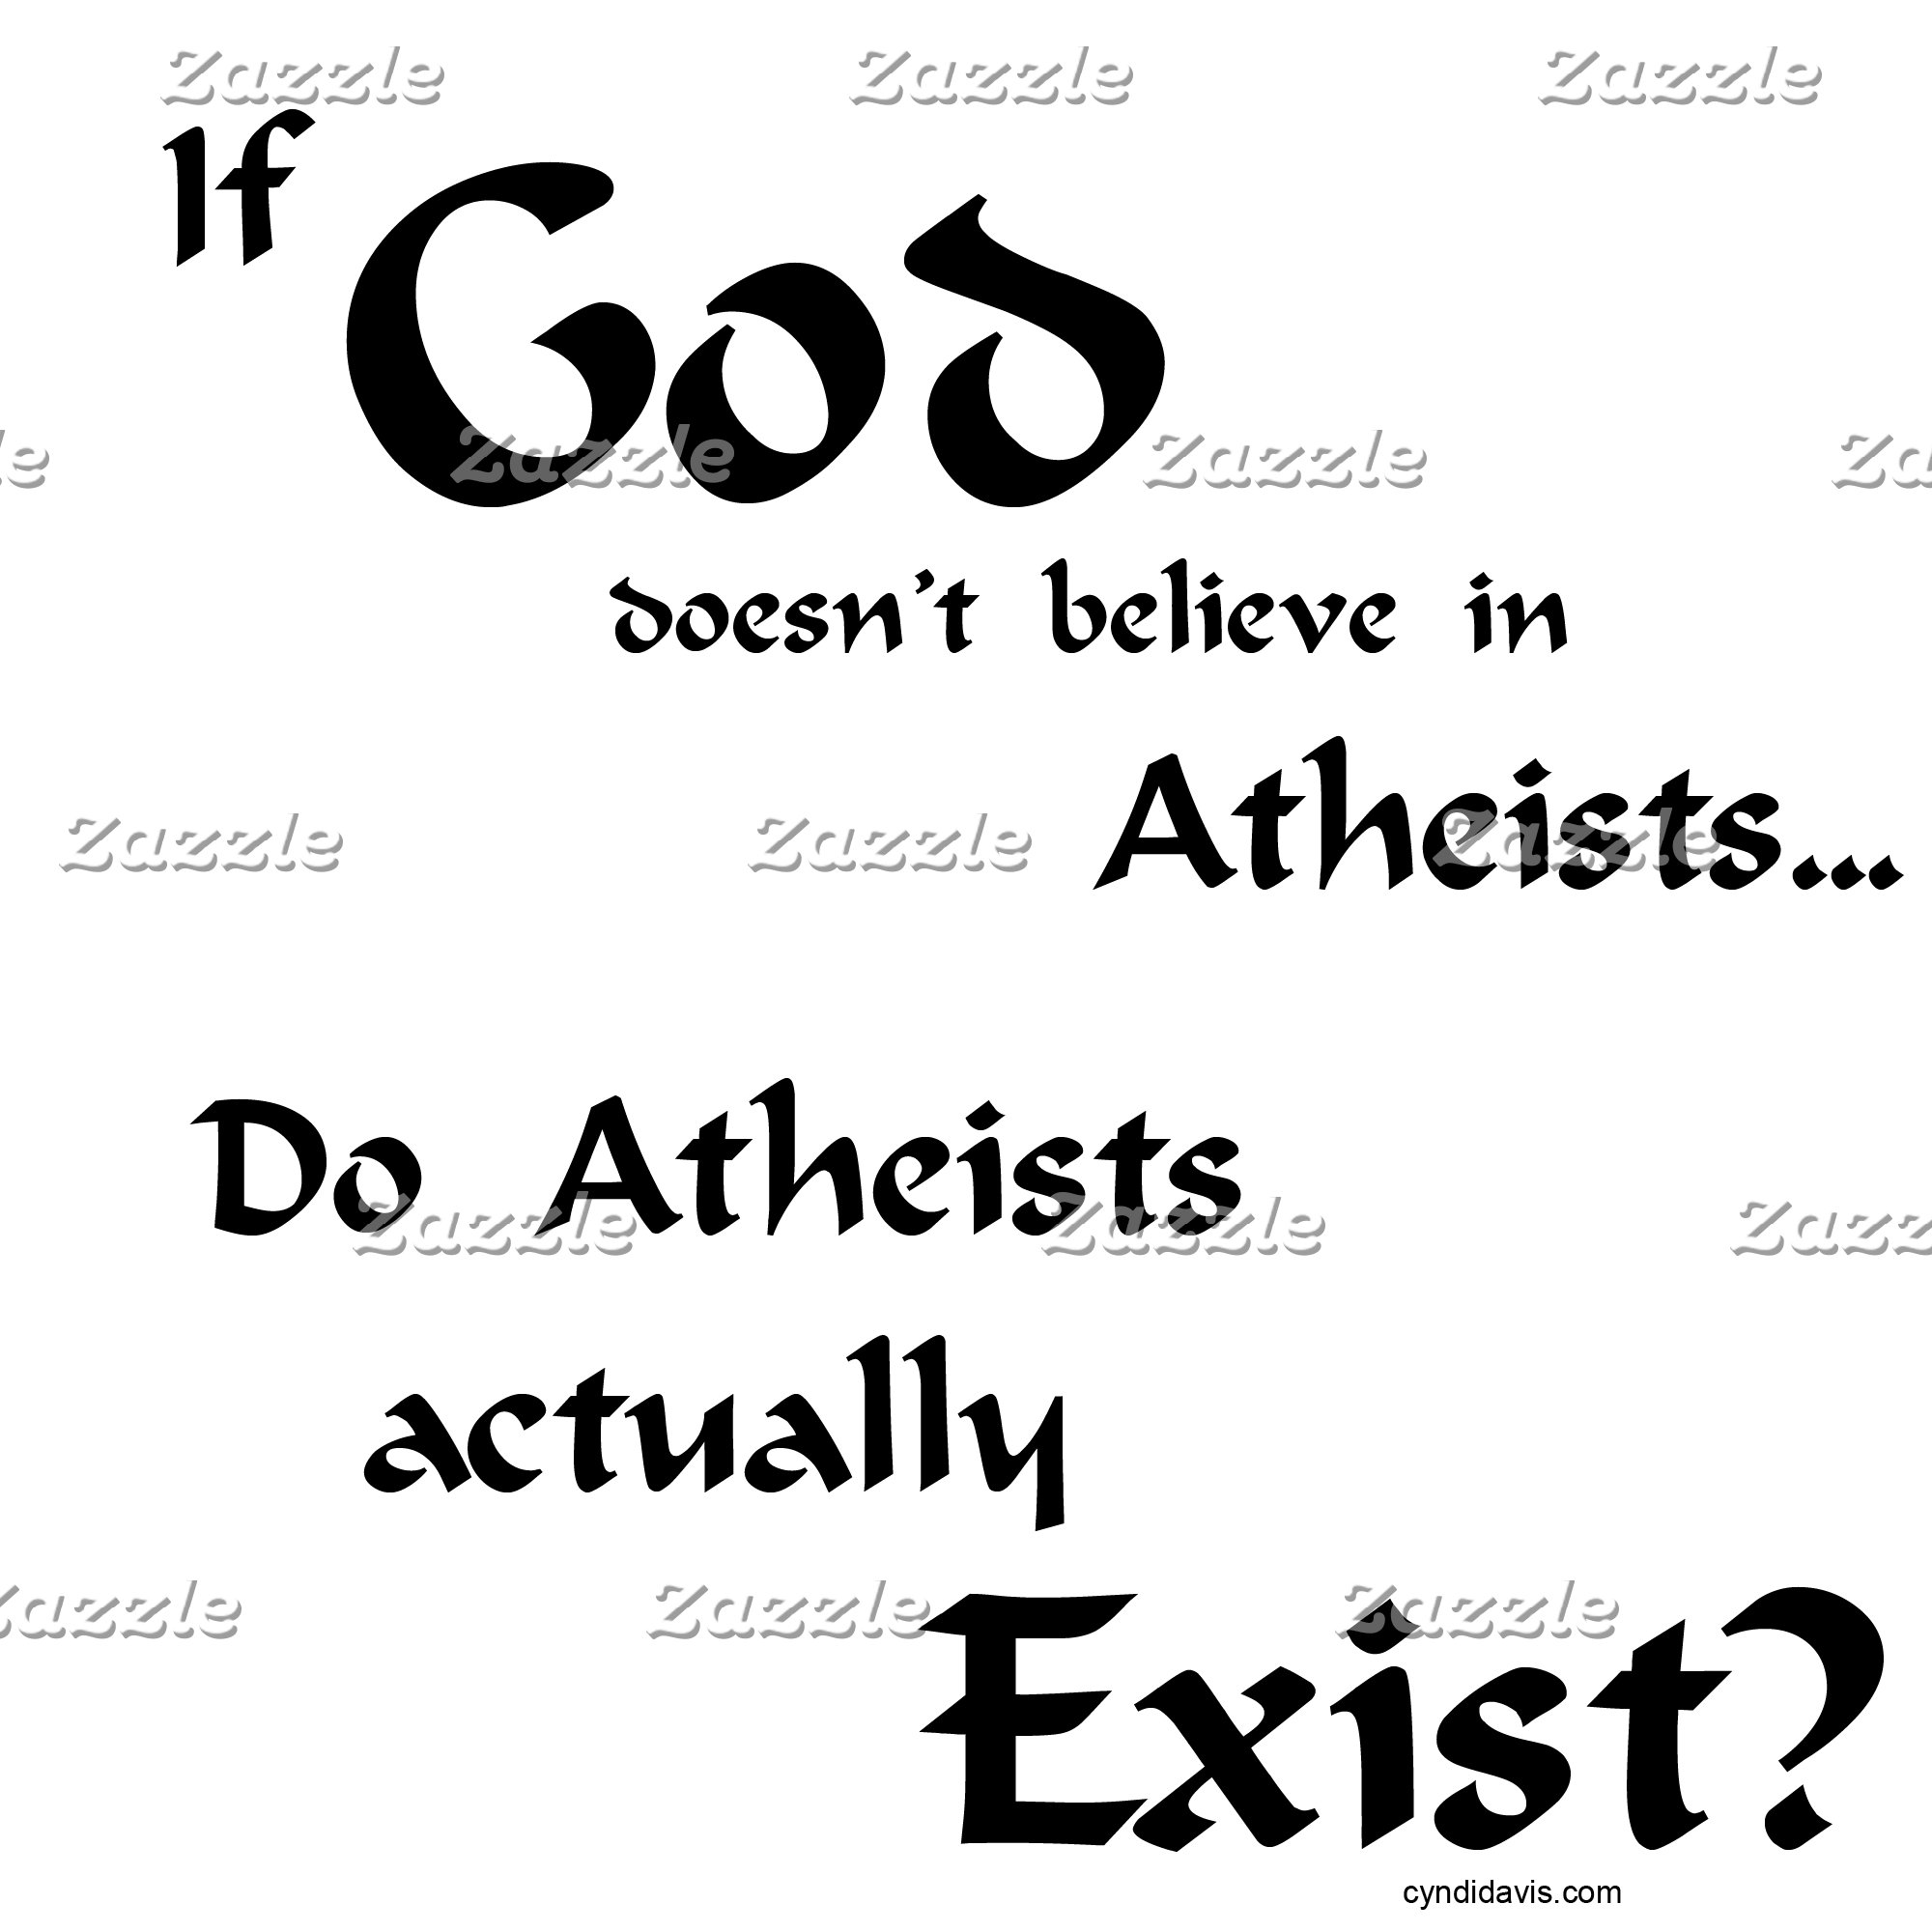 Do atheists exist?